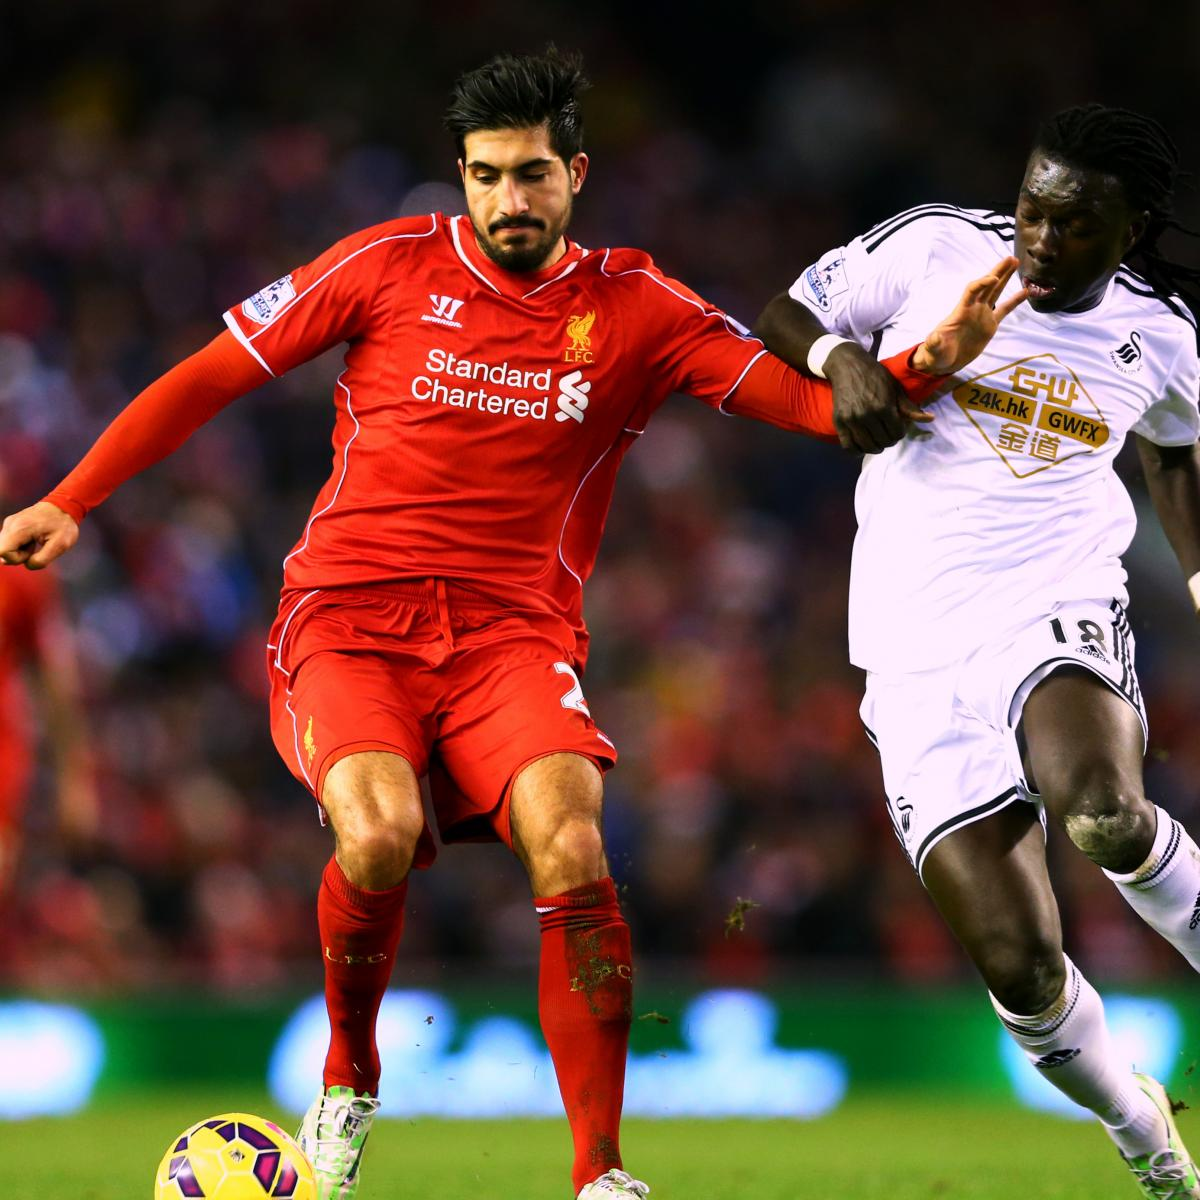 Liverpool Swansea Live Stream